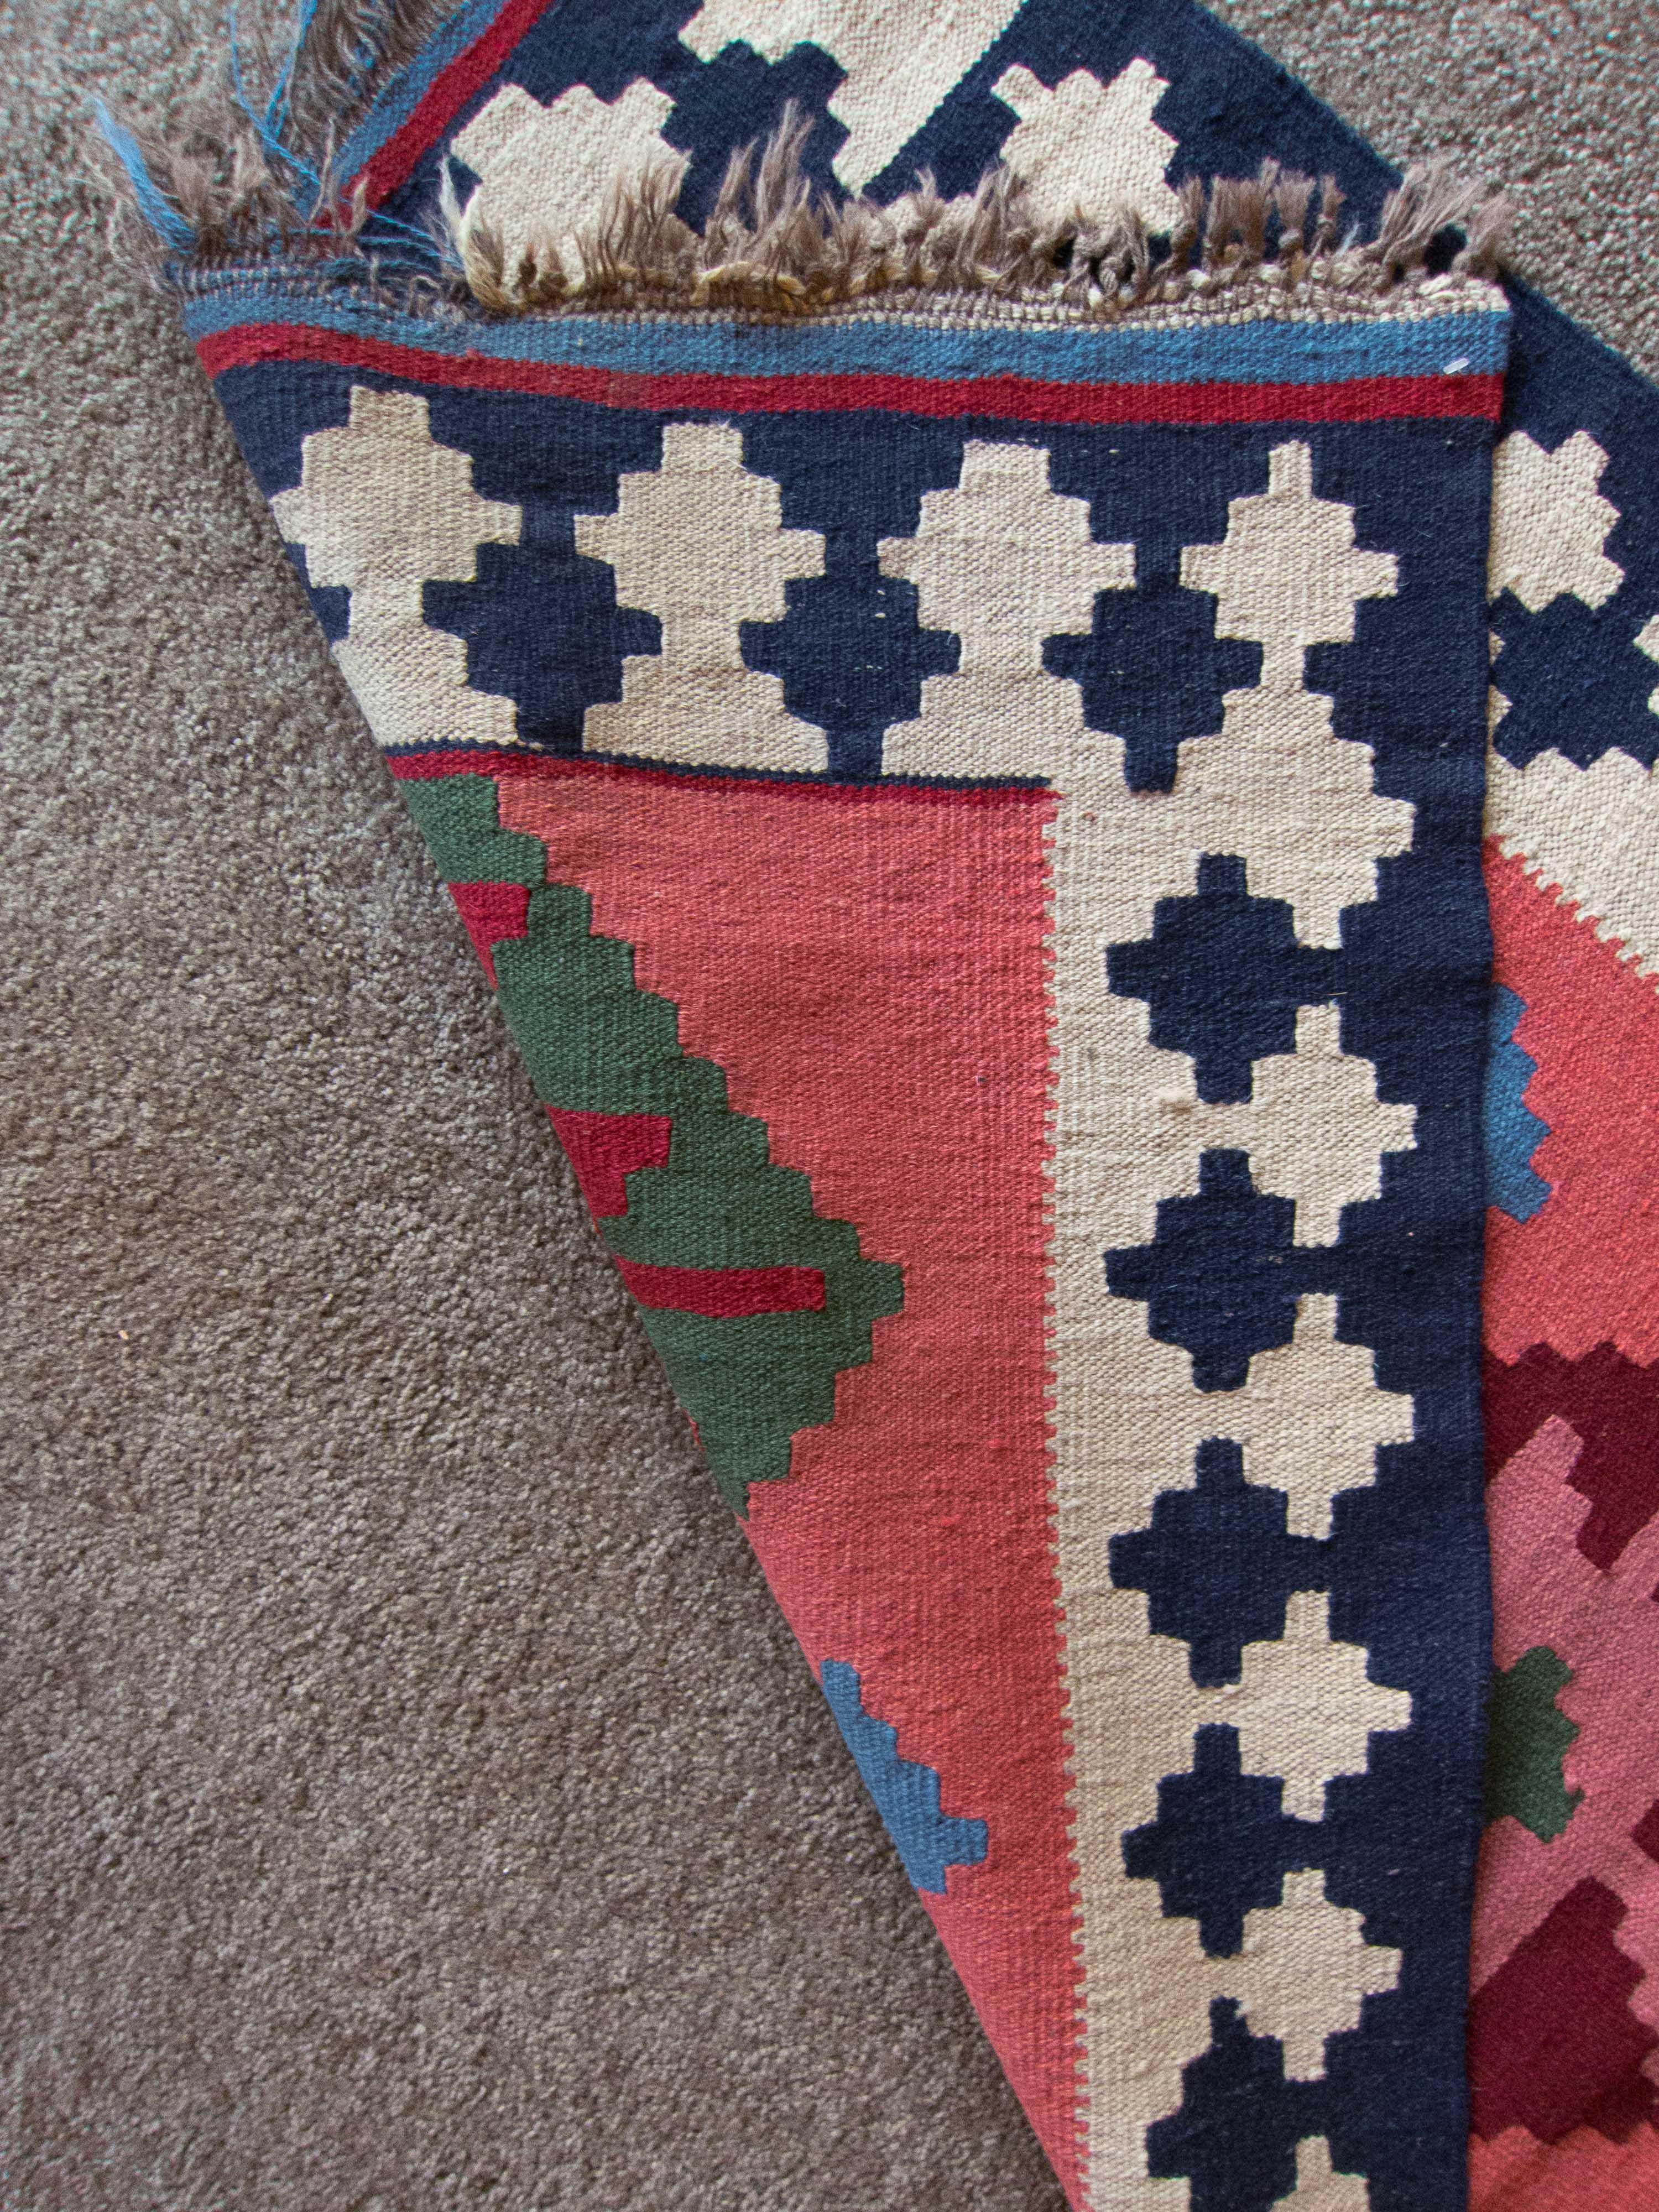 woman rug spiderwoman the weaving navajo art native american of jacob lake gifts inn spider rugs